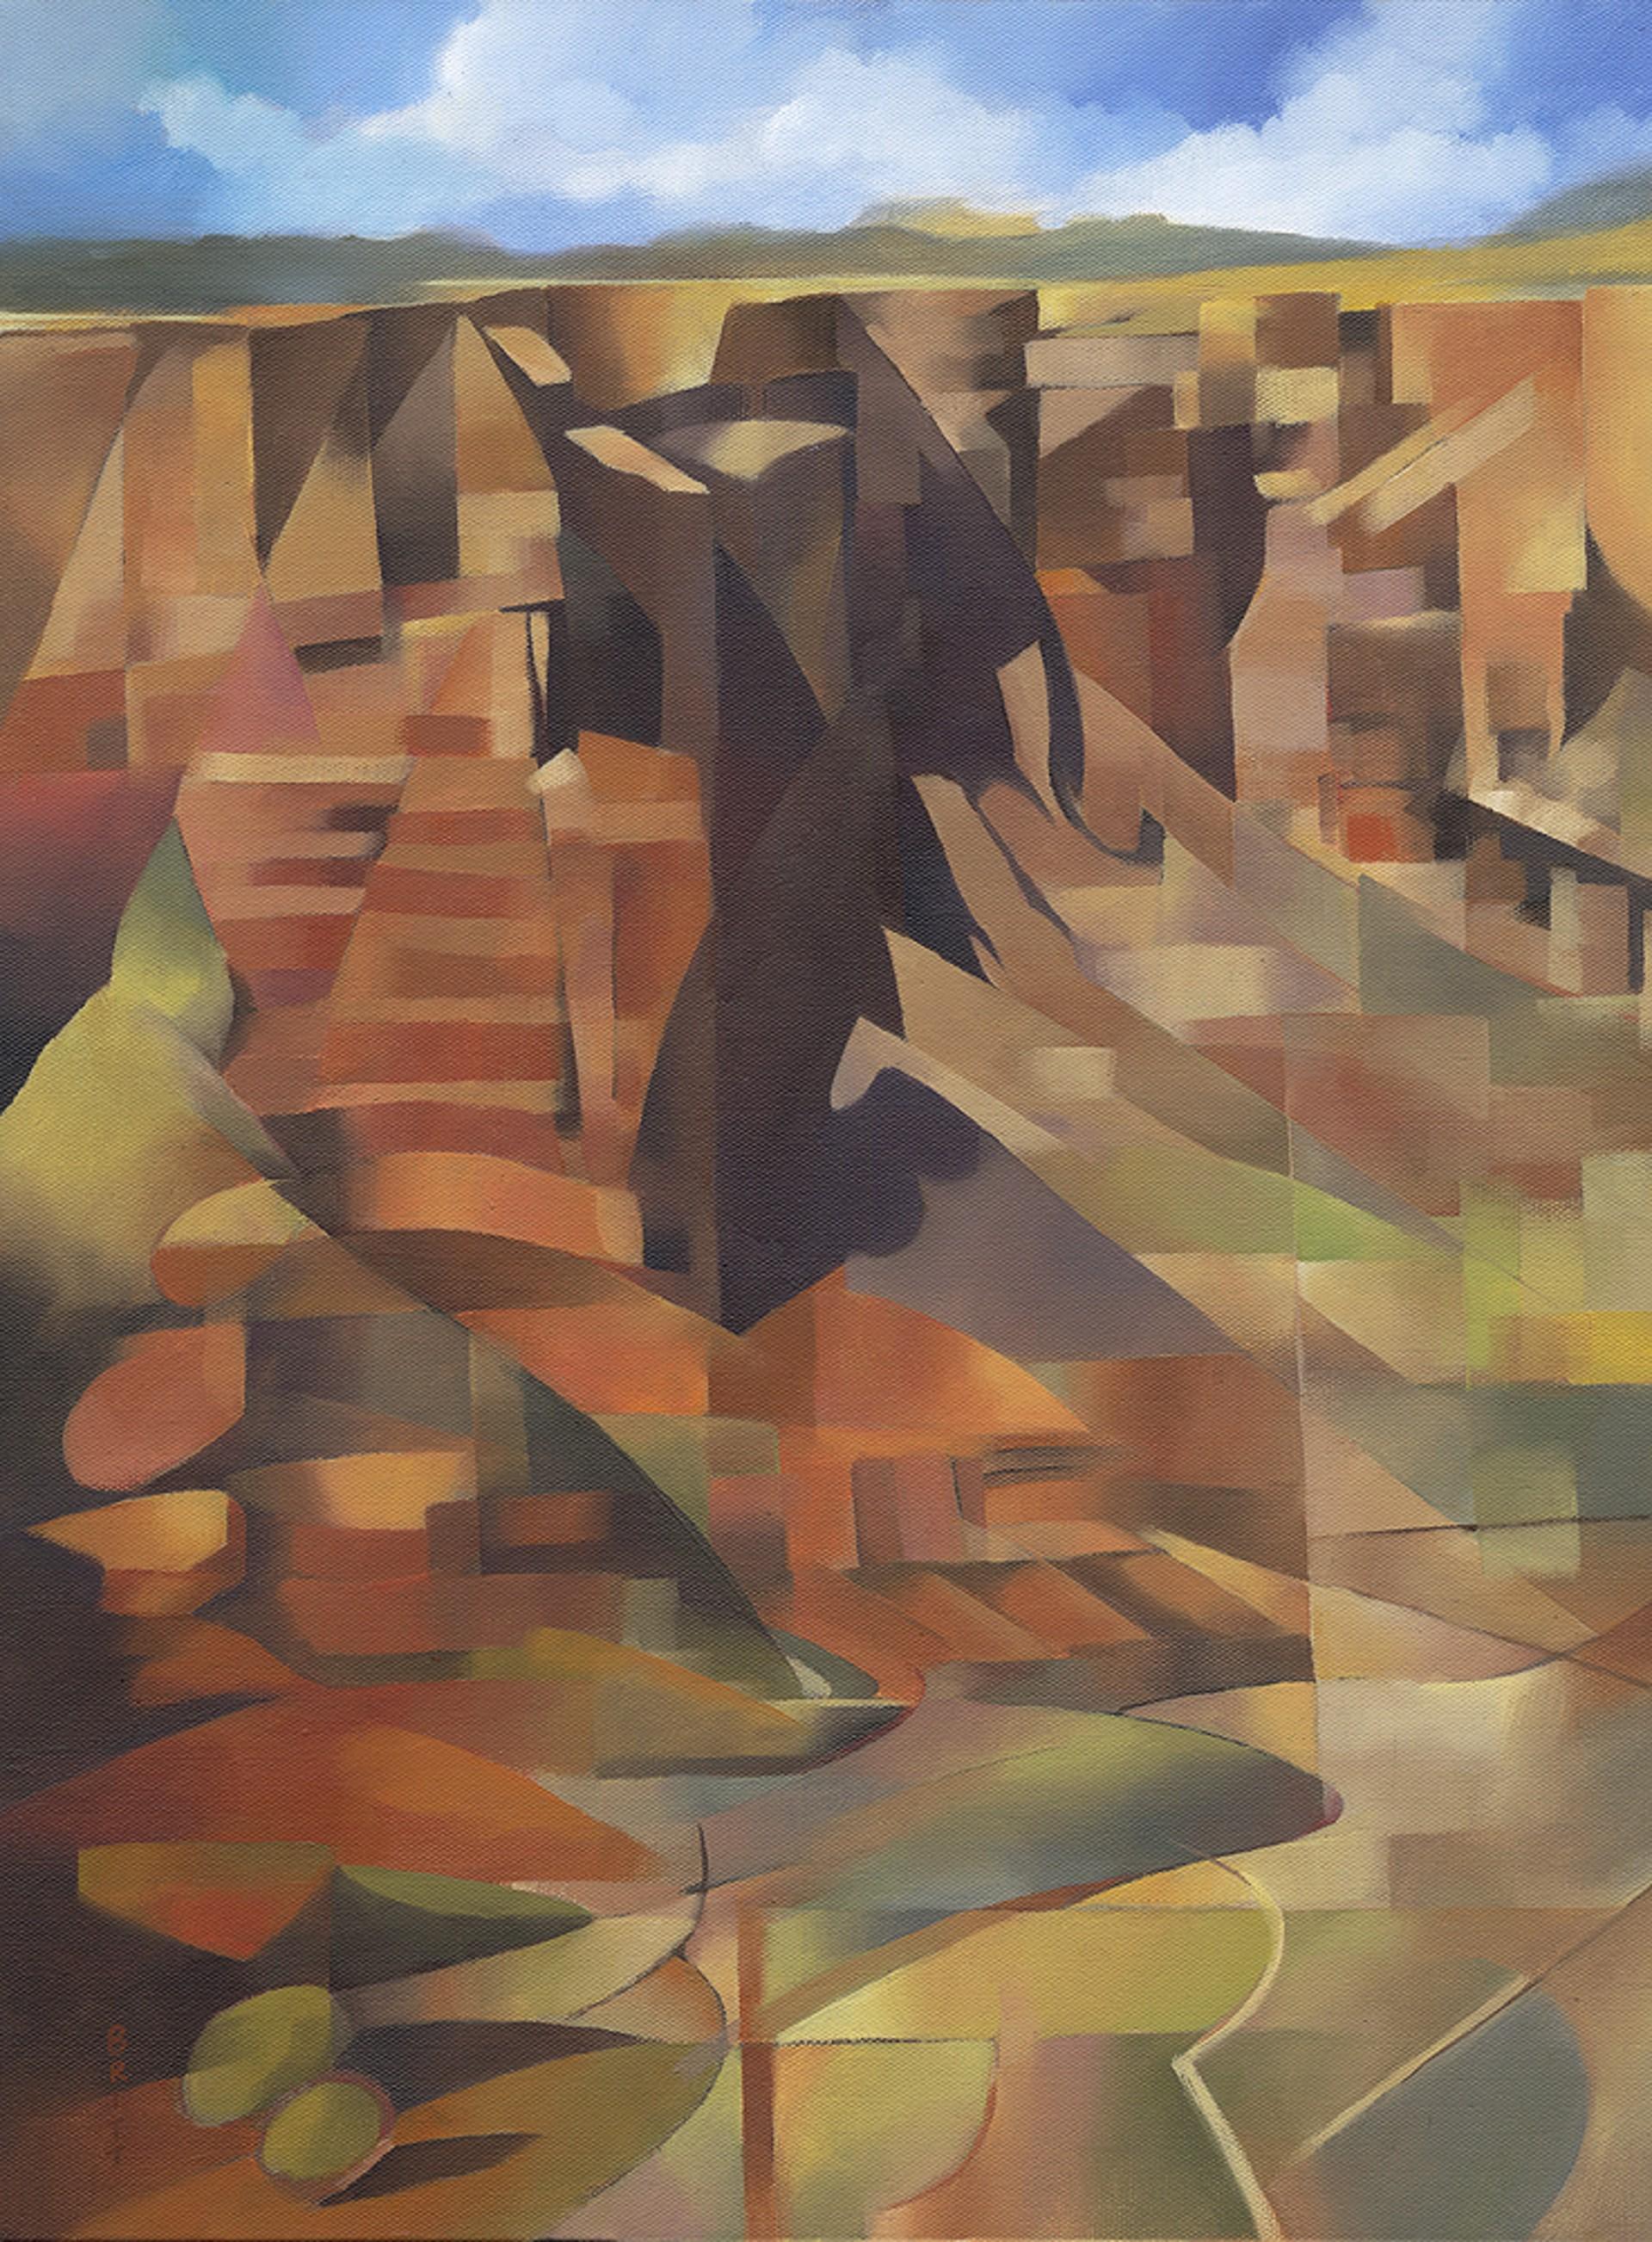 Canyon de Chelly 1 by Stephanie Britt